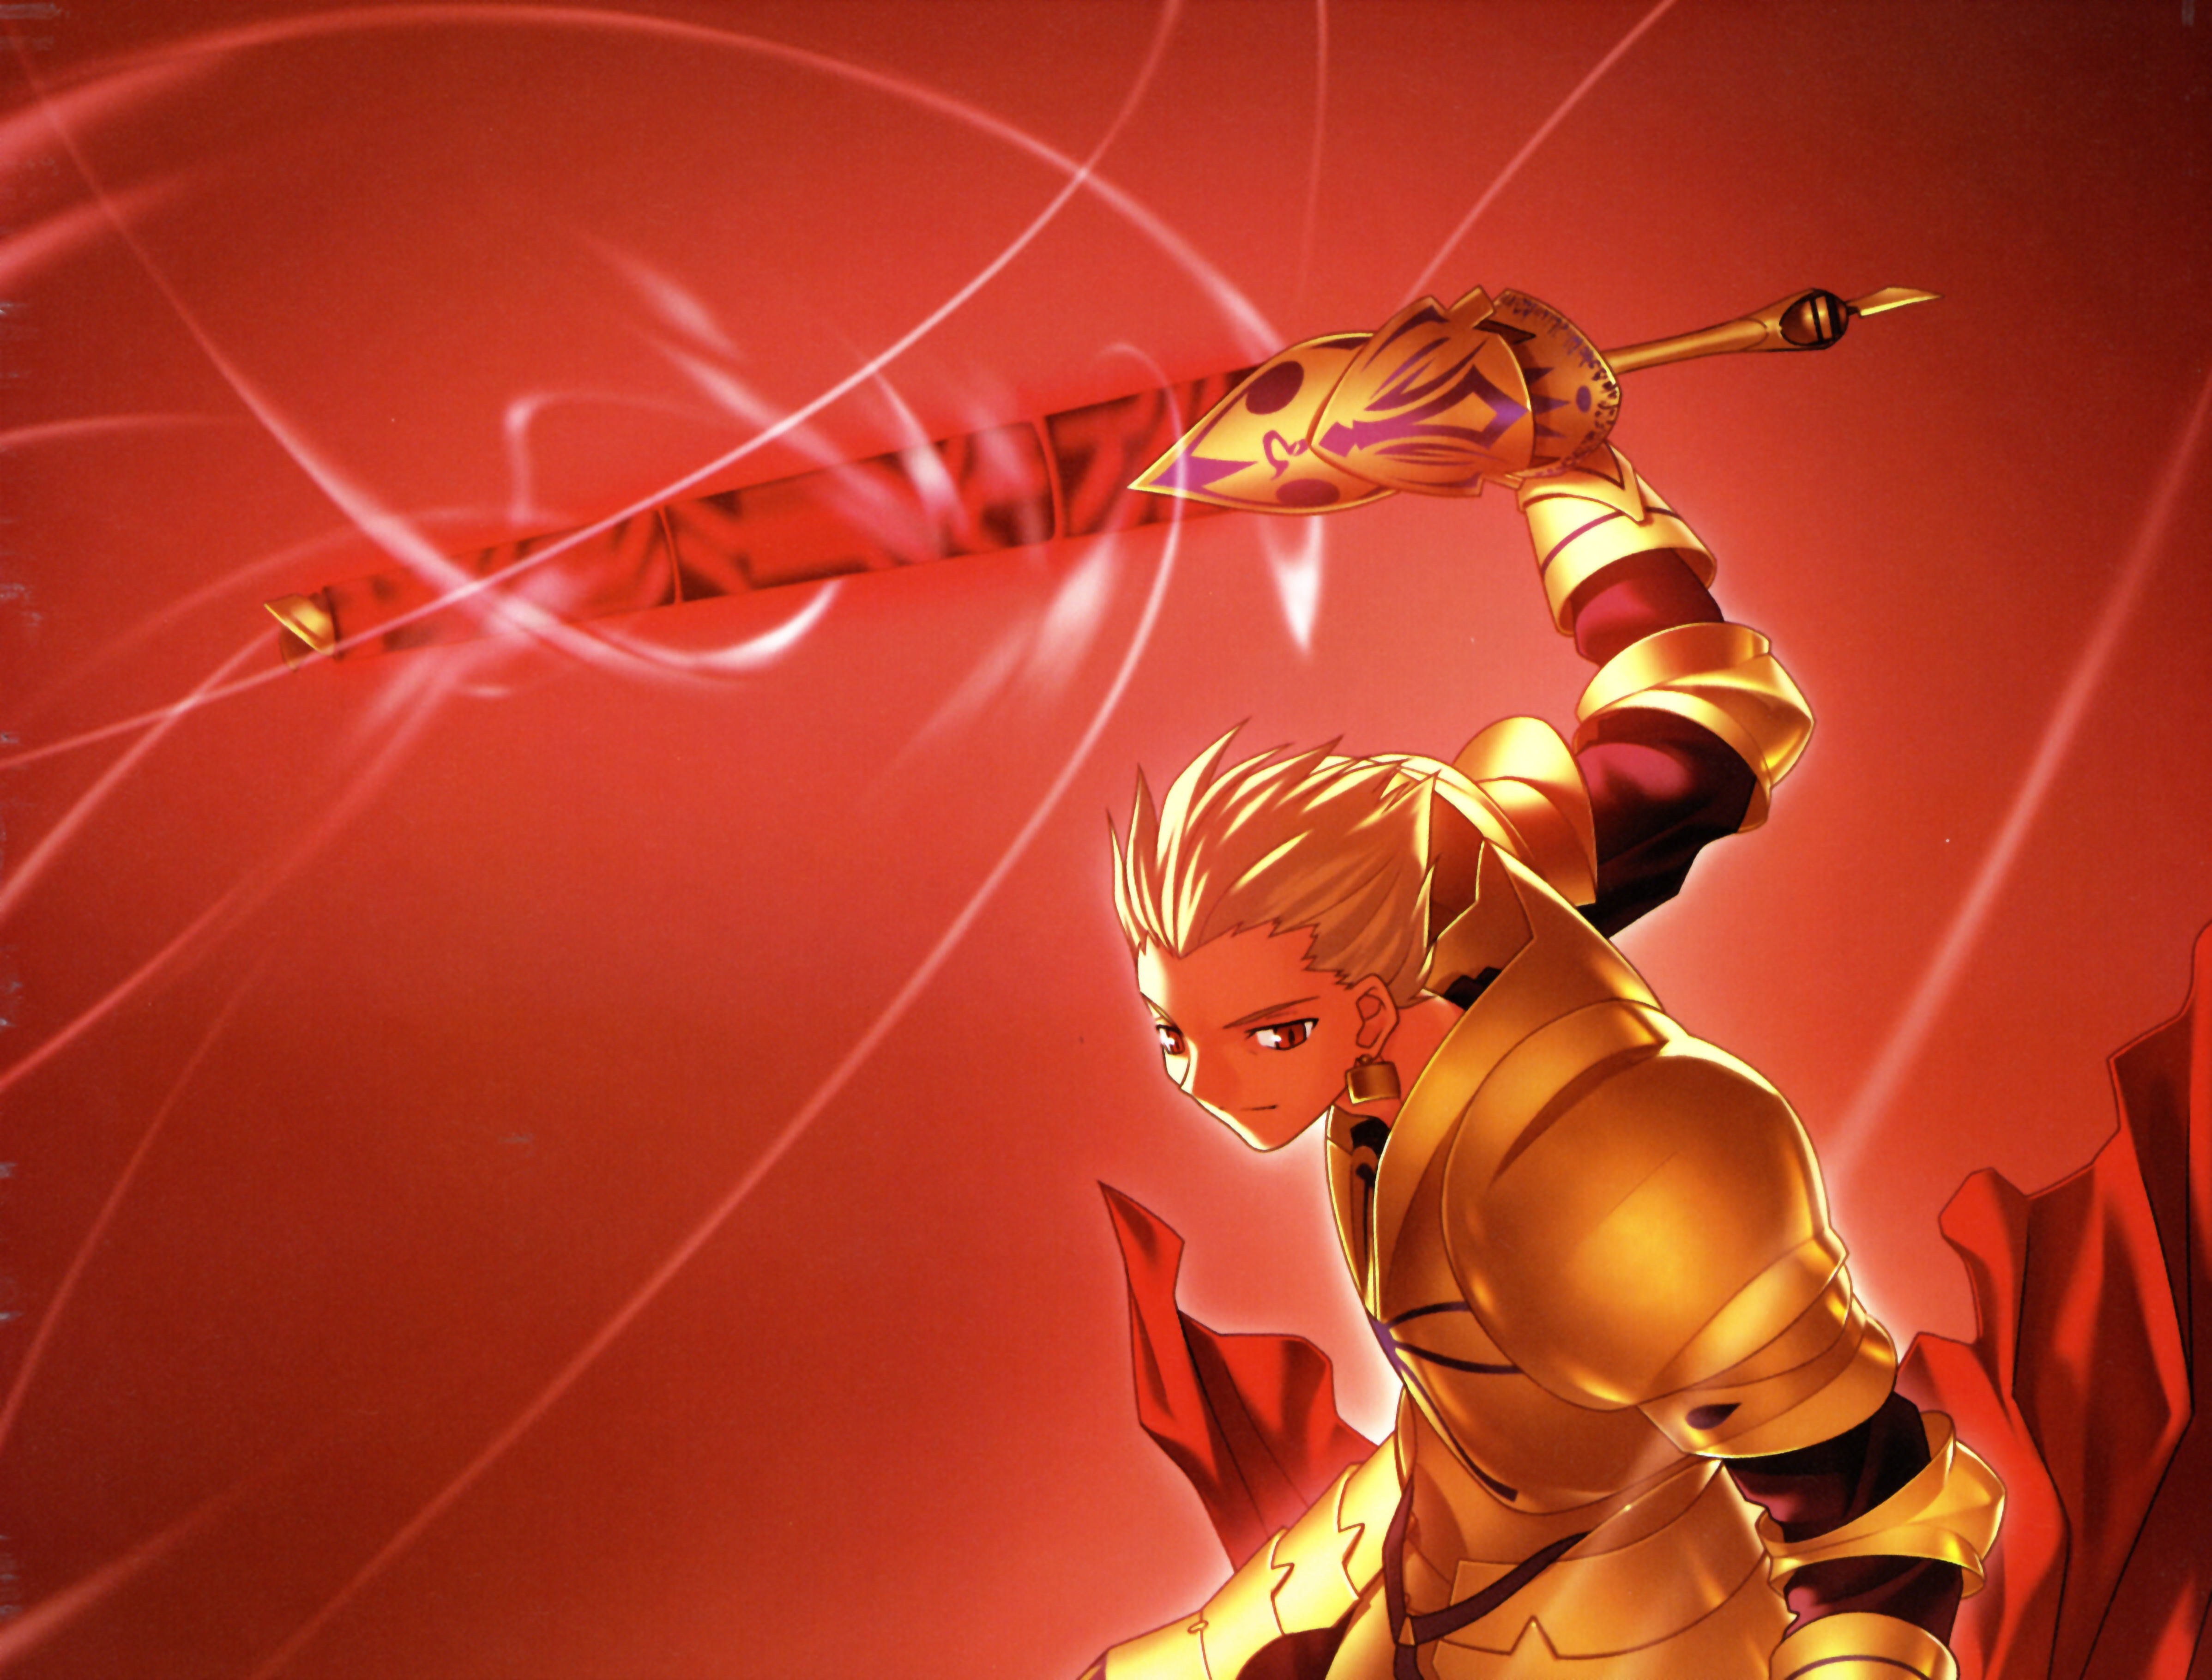 COLLECT 'em ALL: Fate/Zero Gilgamesh Ichiban Kuji Premium C Figure